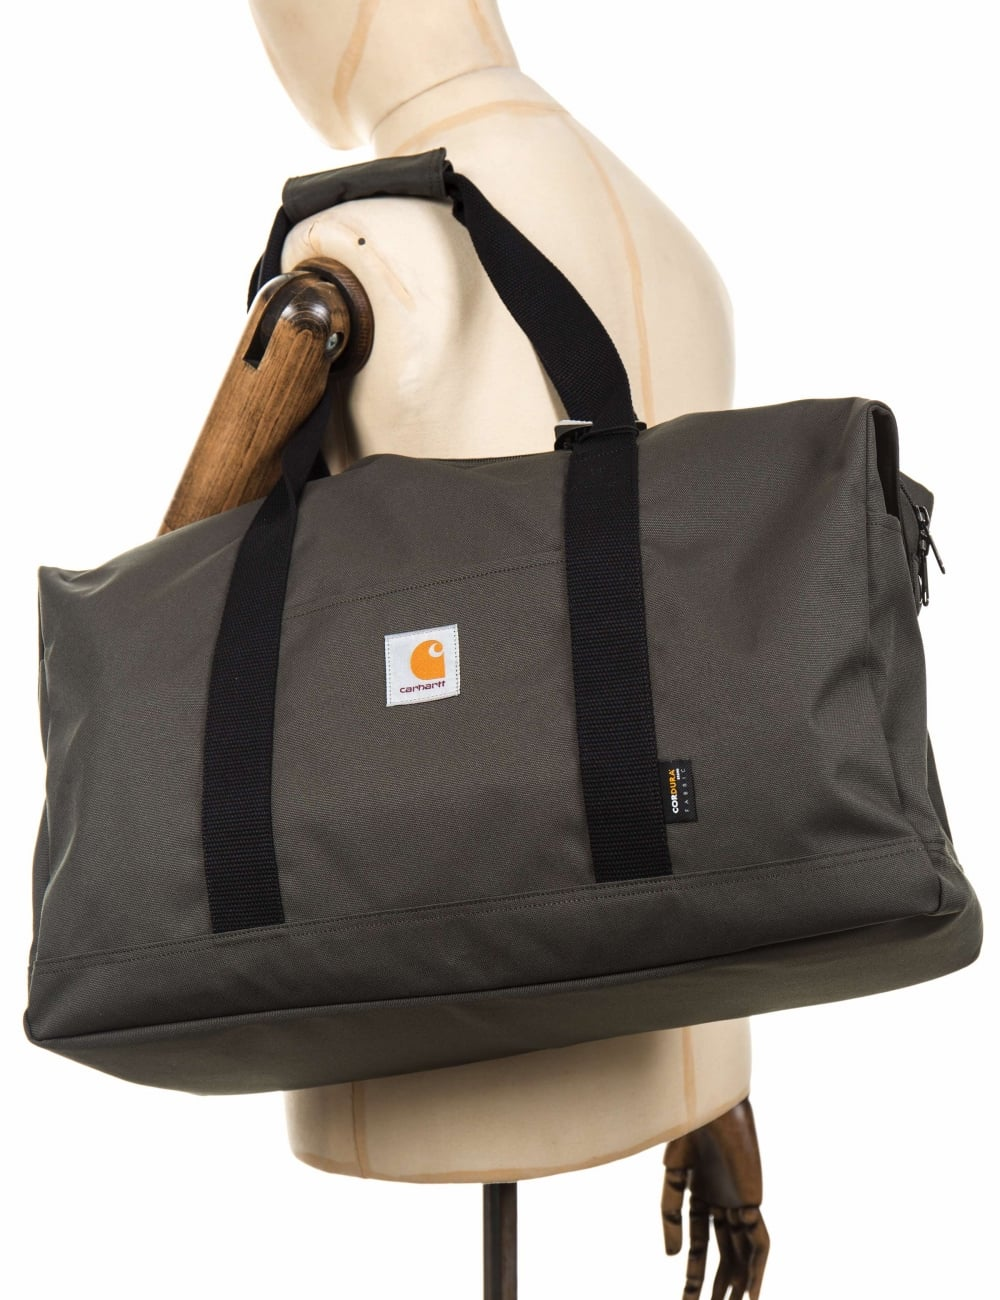 27e1679750 Carhartt WIP Watch Sports Bag - Cypress Black - Accessories from Fat ...